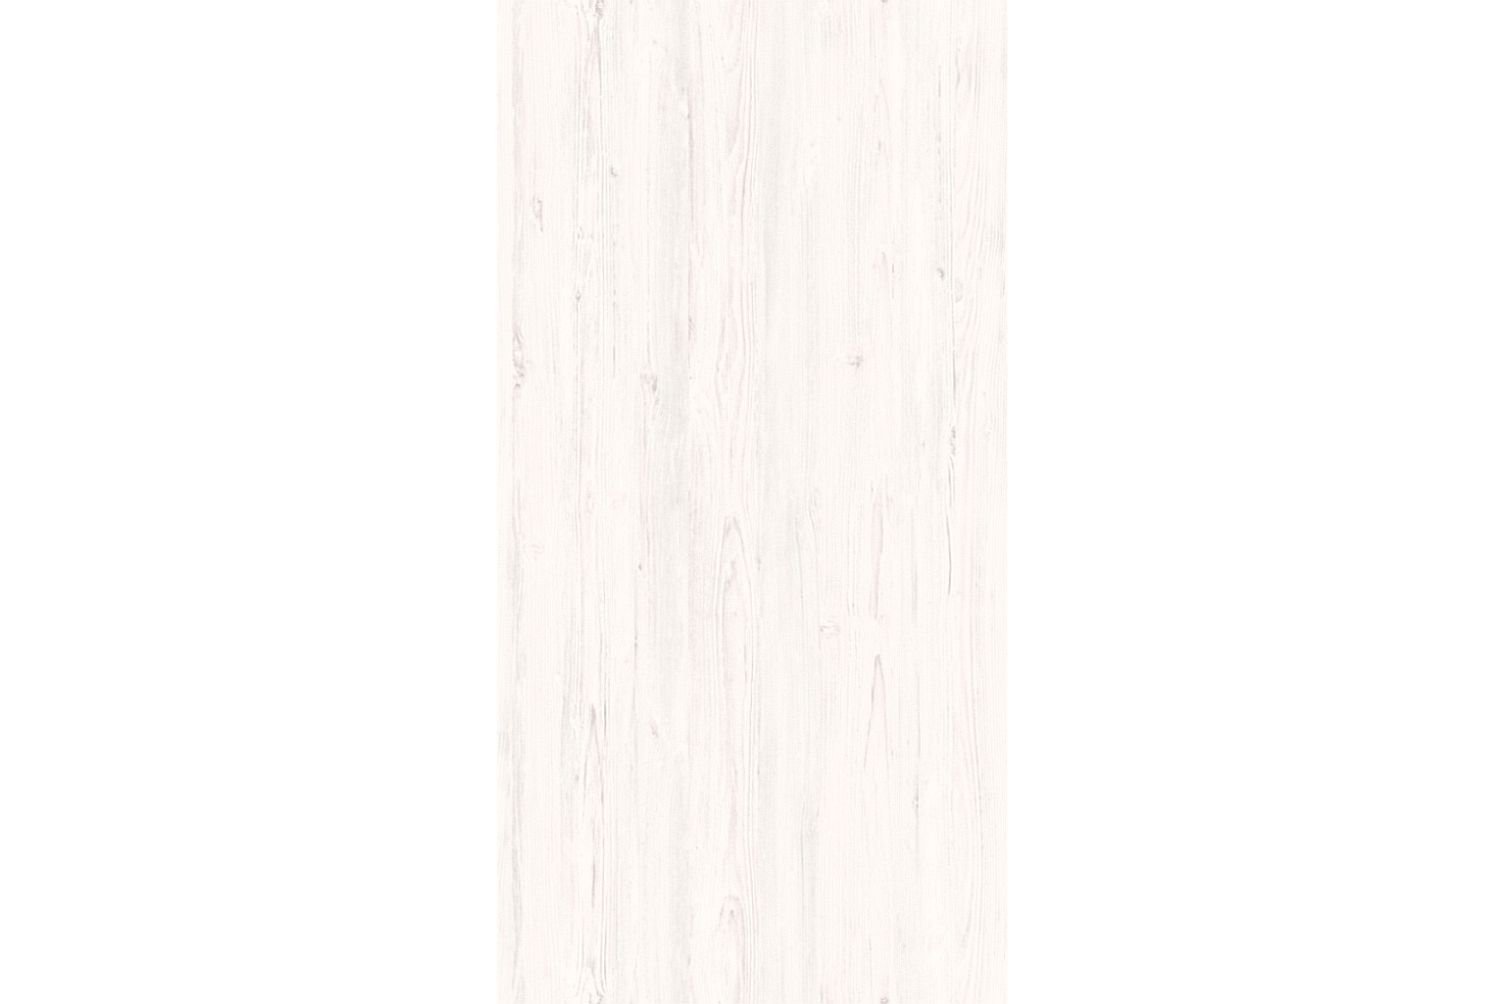 Aufsatzvitrine Dandy 0683/01-2GL-A_K anderson pine/stirling oak